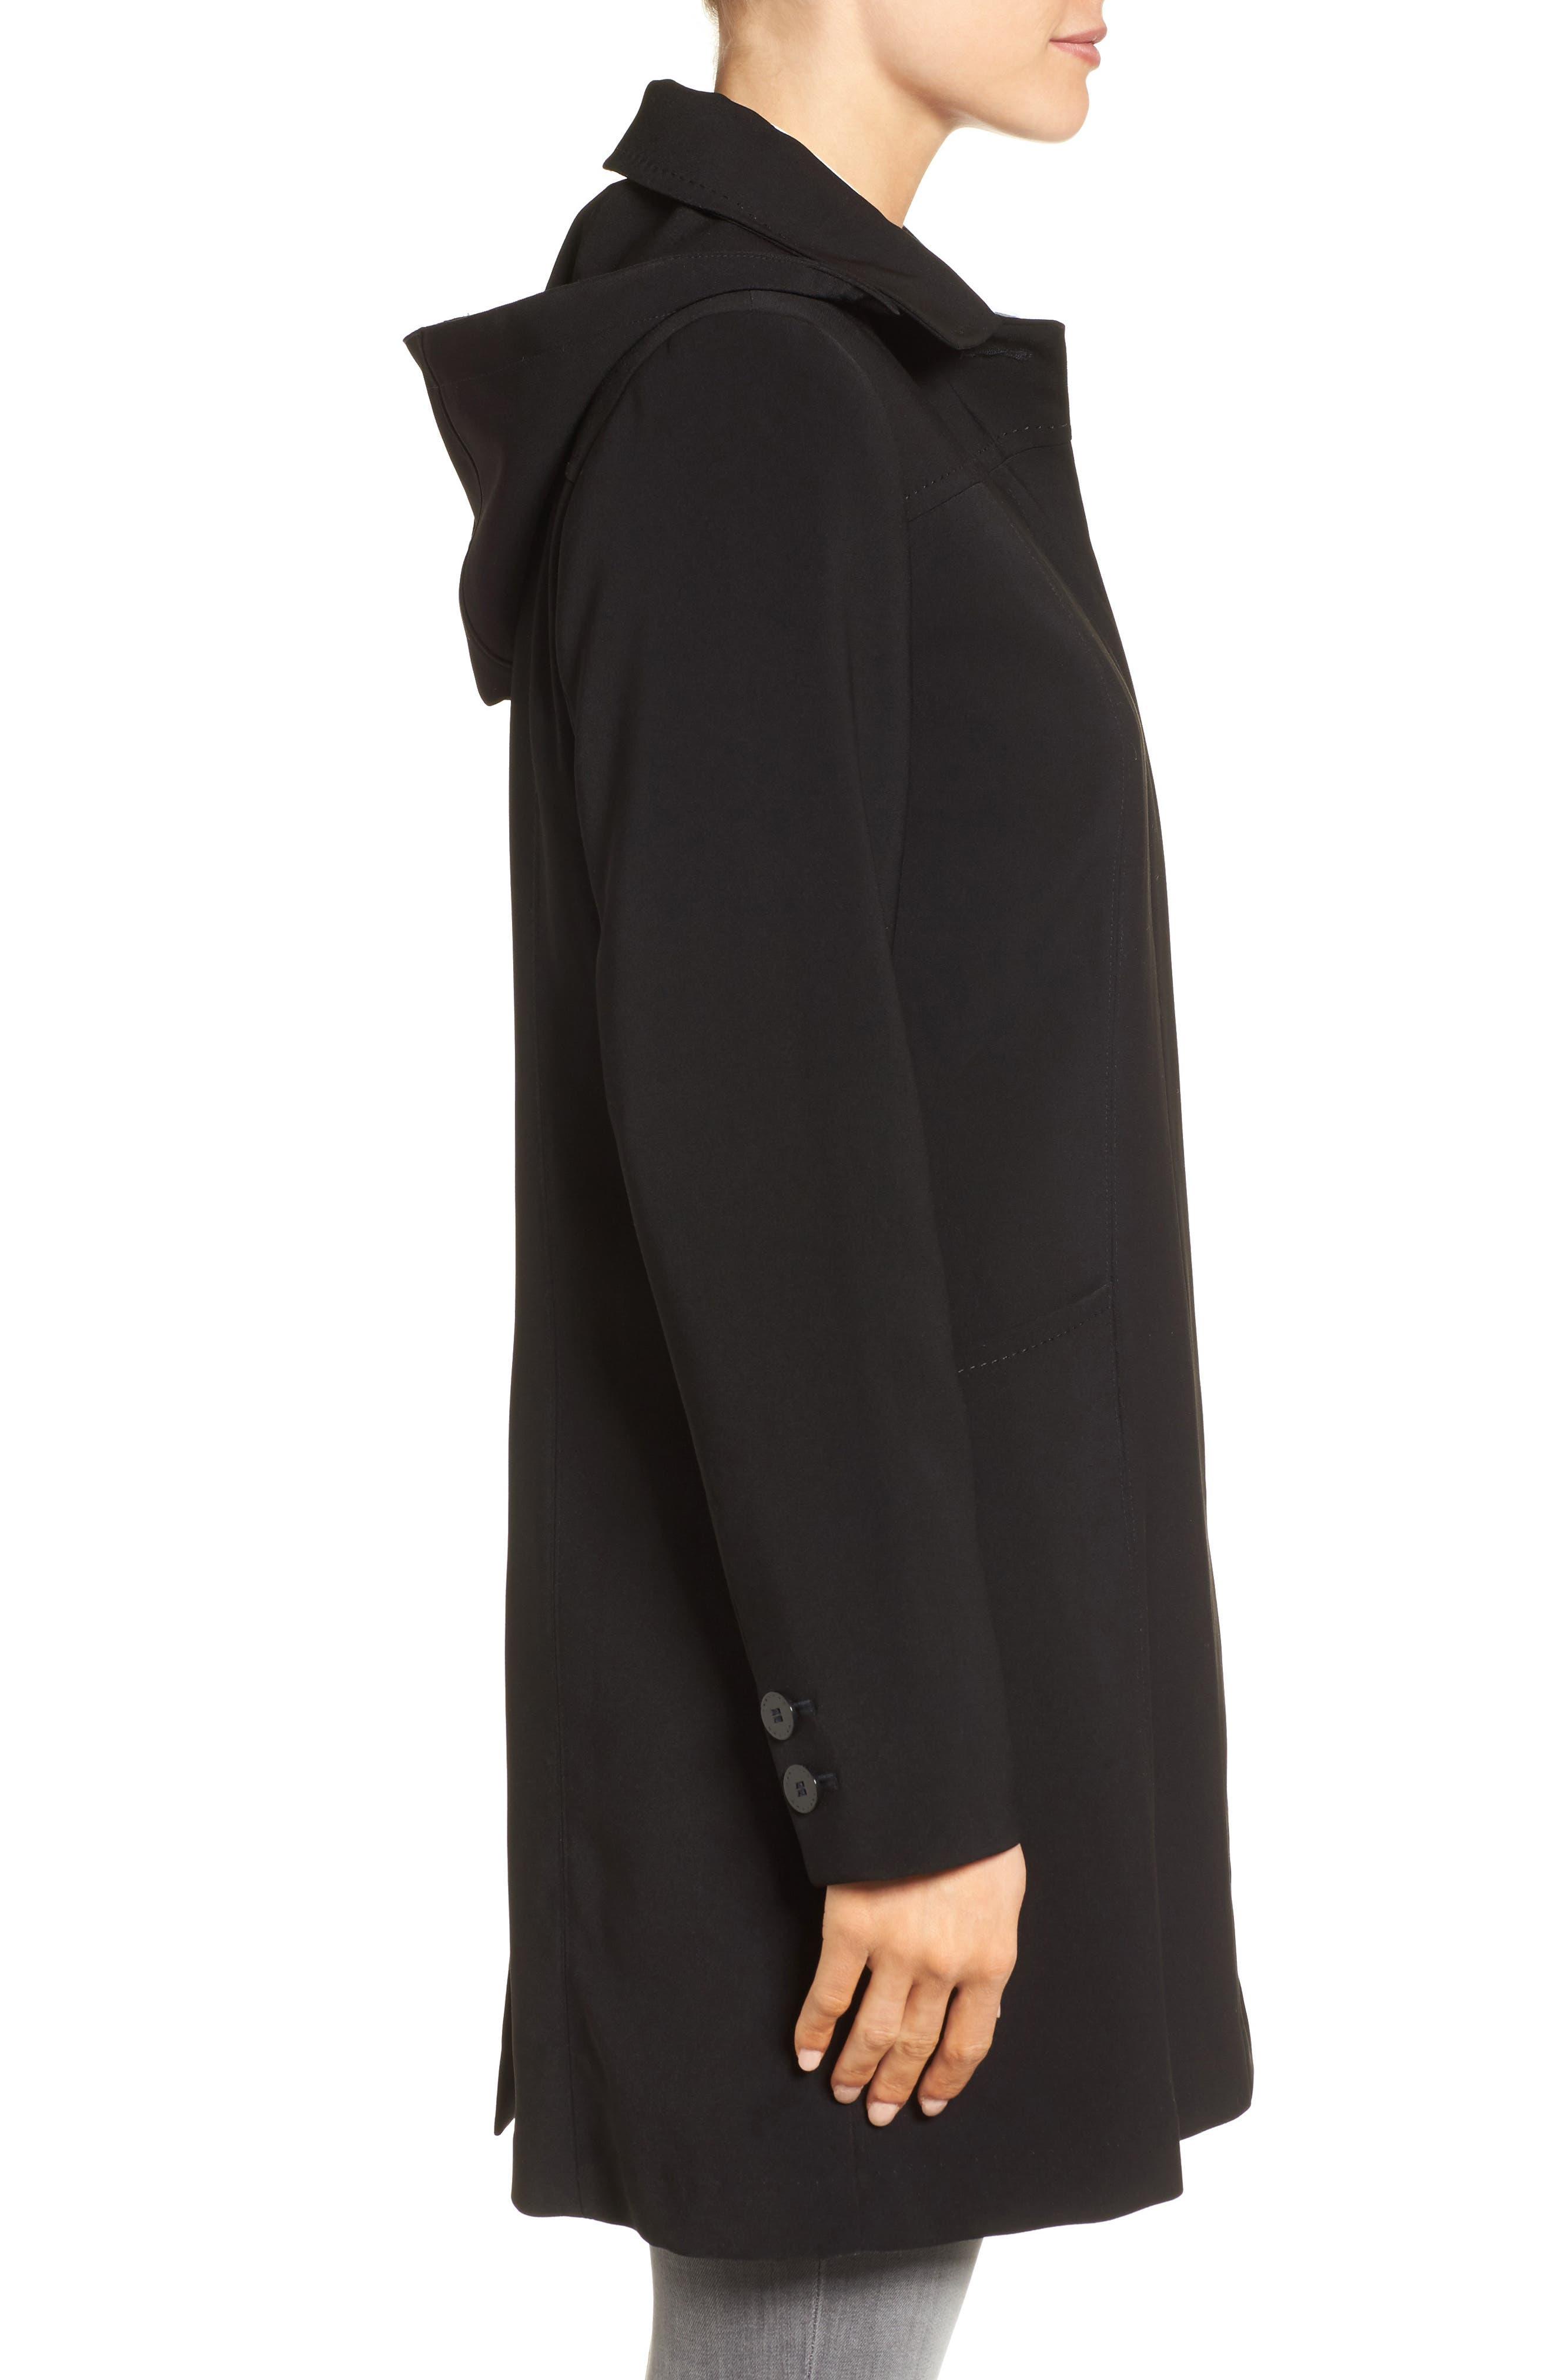 Alternate Image 3  - Gallery Pickstitch Nepage Walking Coat with Detachable Hood (Regular & Petite)